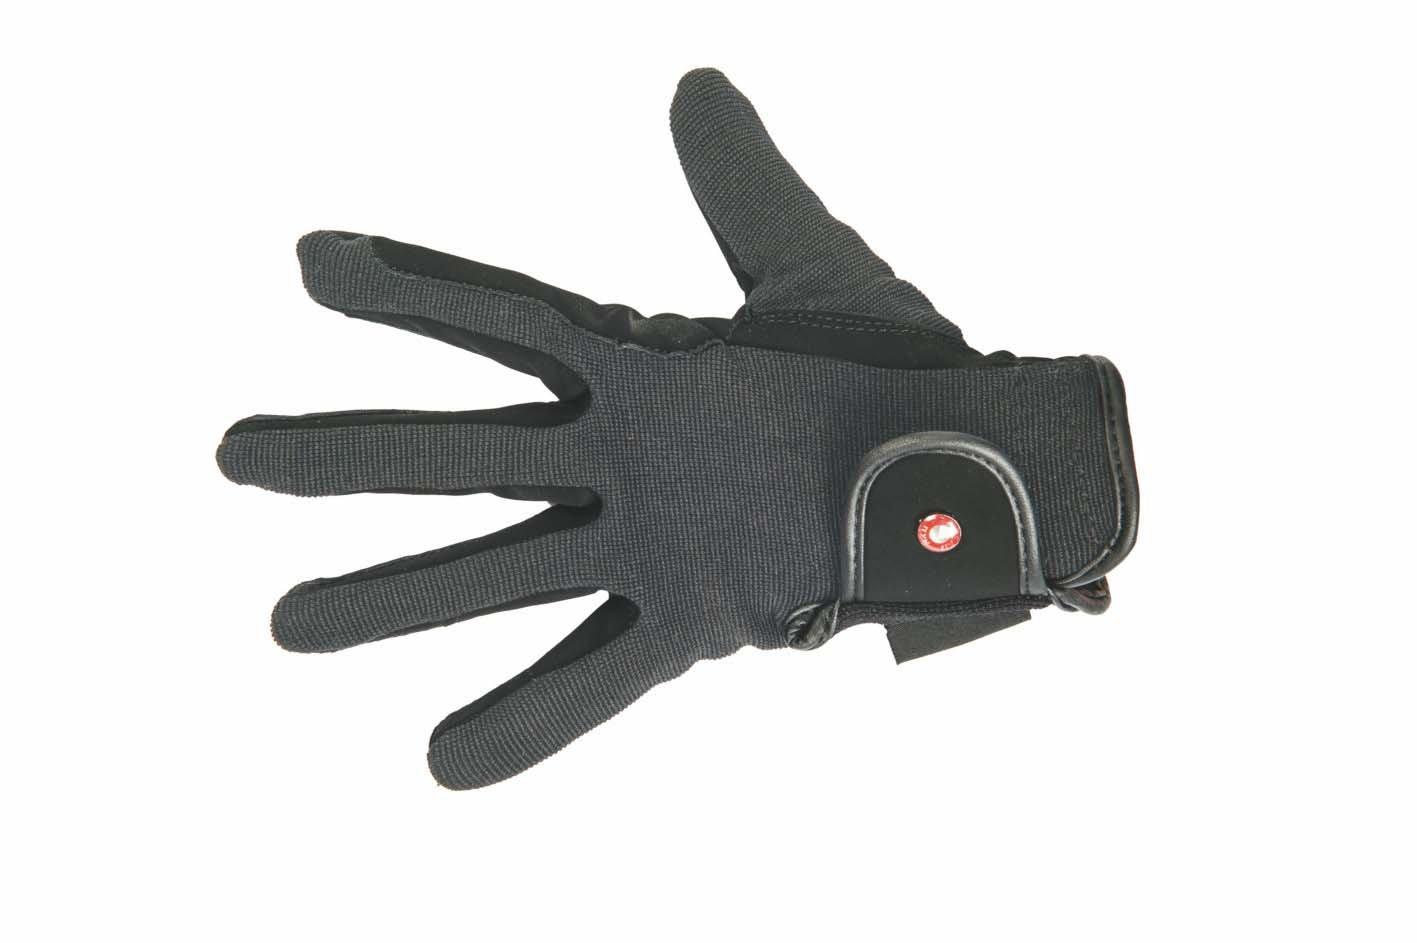 HKM Damen Reithandschuh -Professional Nubuk Lederimitat Handschuhe 6887